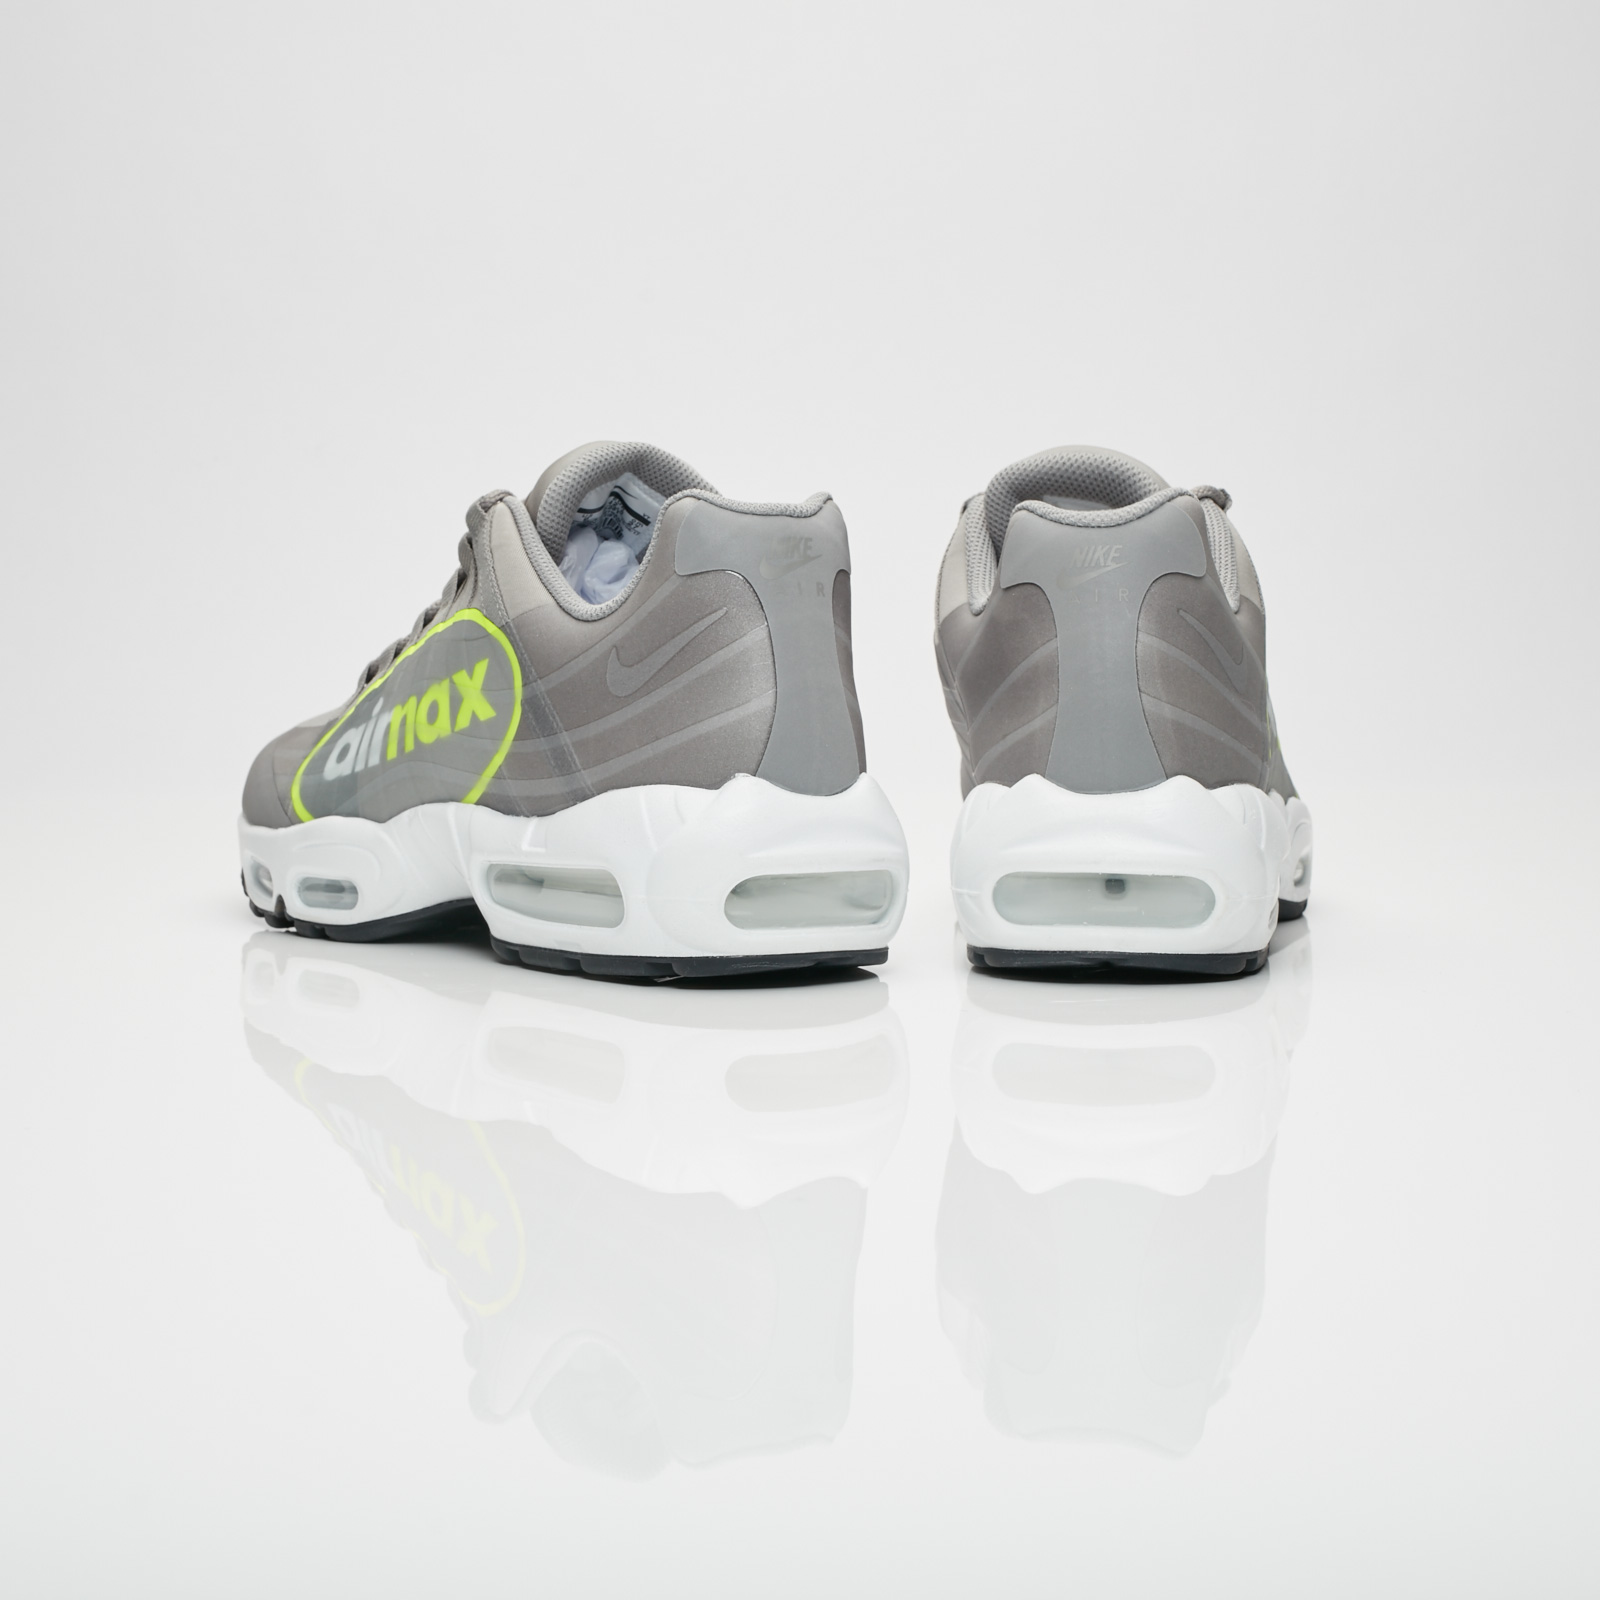 aab8dfb1ca Nike Air Max 95 NS GPX - Aj7183-001 - Sneakersnstuff | sneakers &  streetwear online since 1999